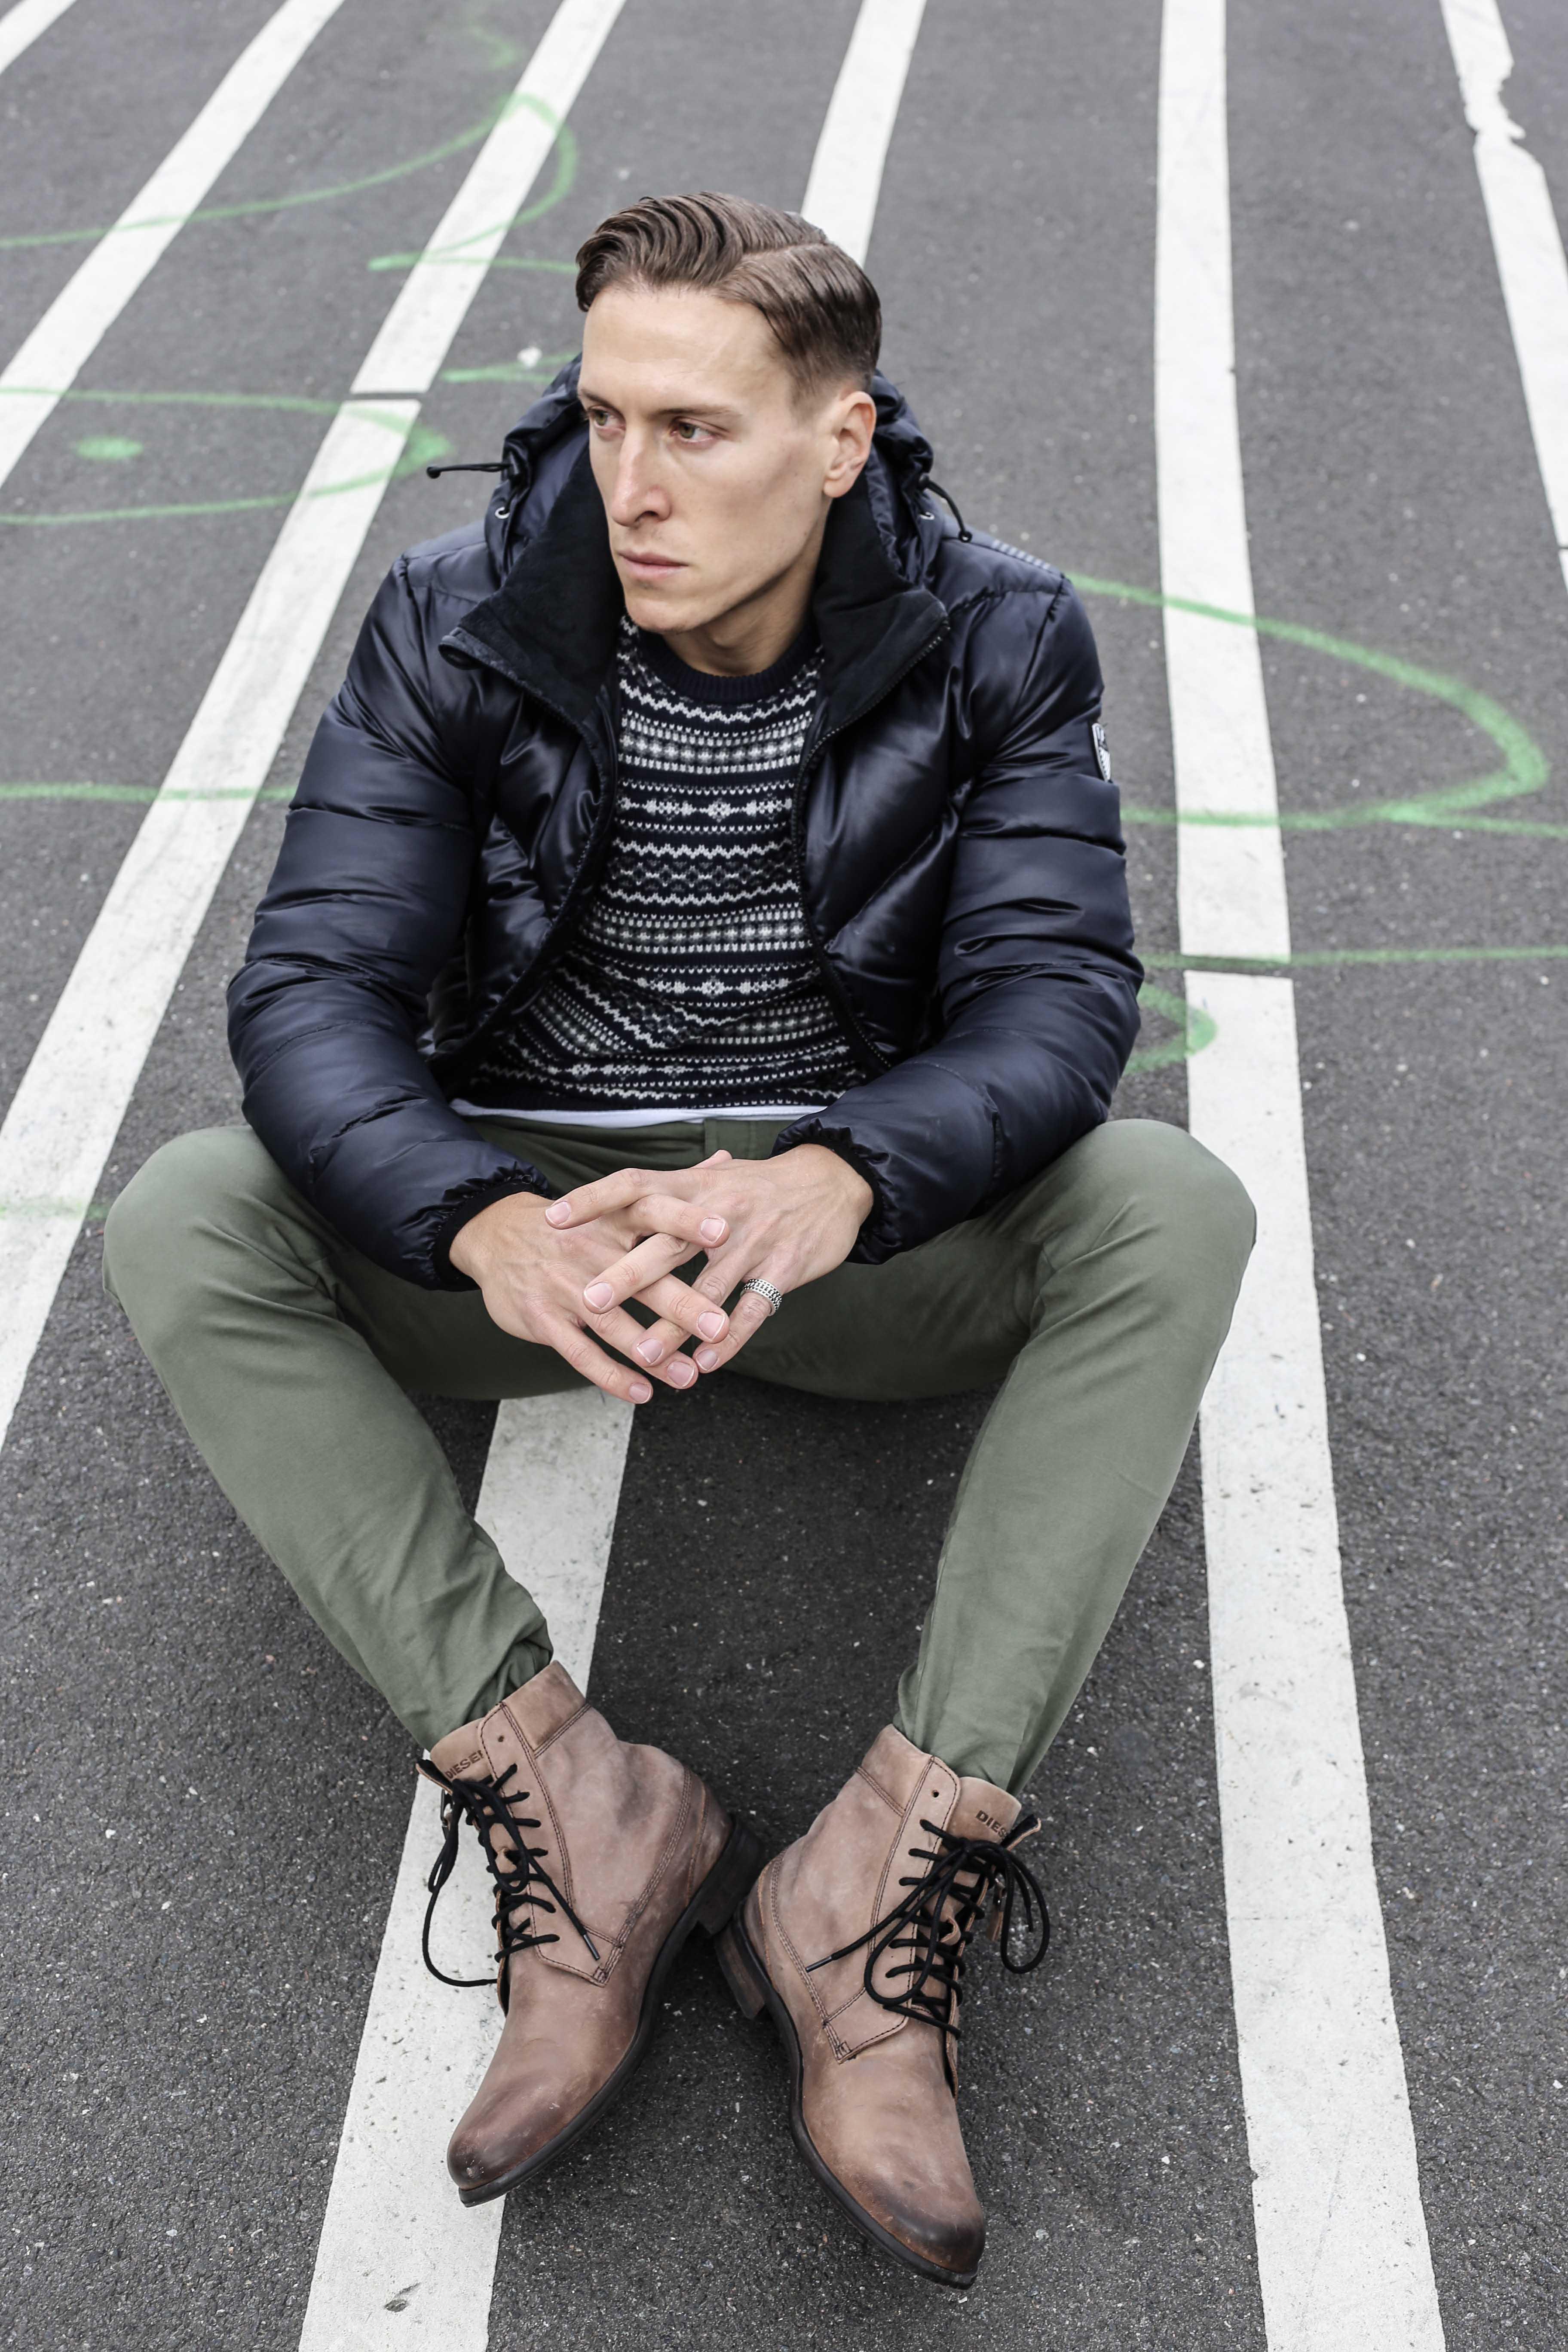 norweger-pulli-olivgruene-chino-dunkelblaue-daunenjacke-braune-lederstiefel-winter-look-menfashion-modeblog-berlin_4592